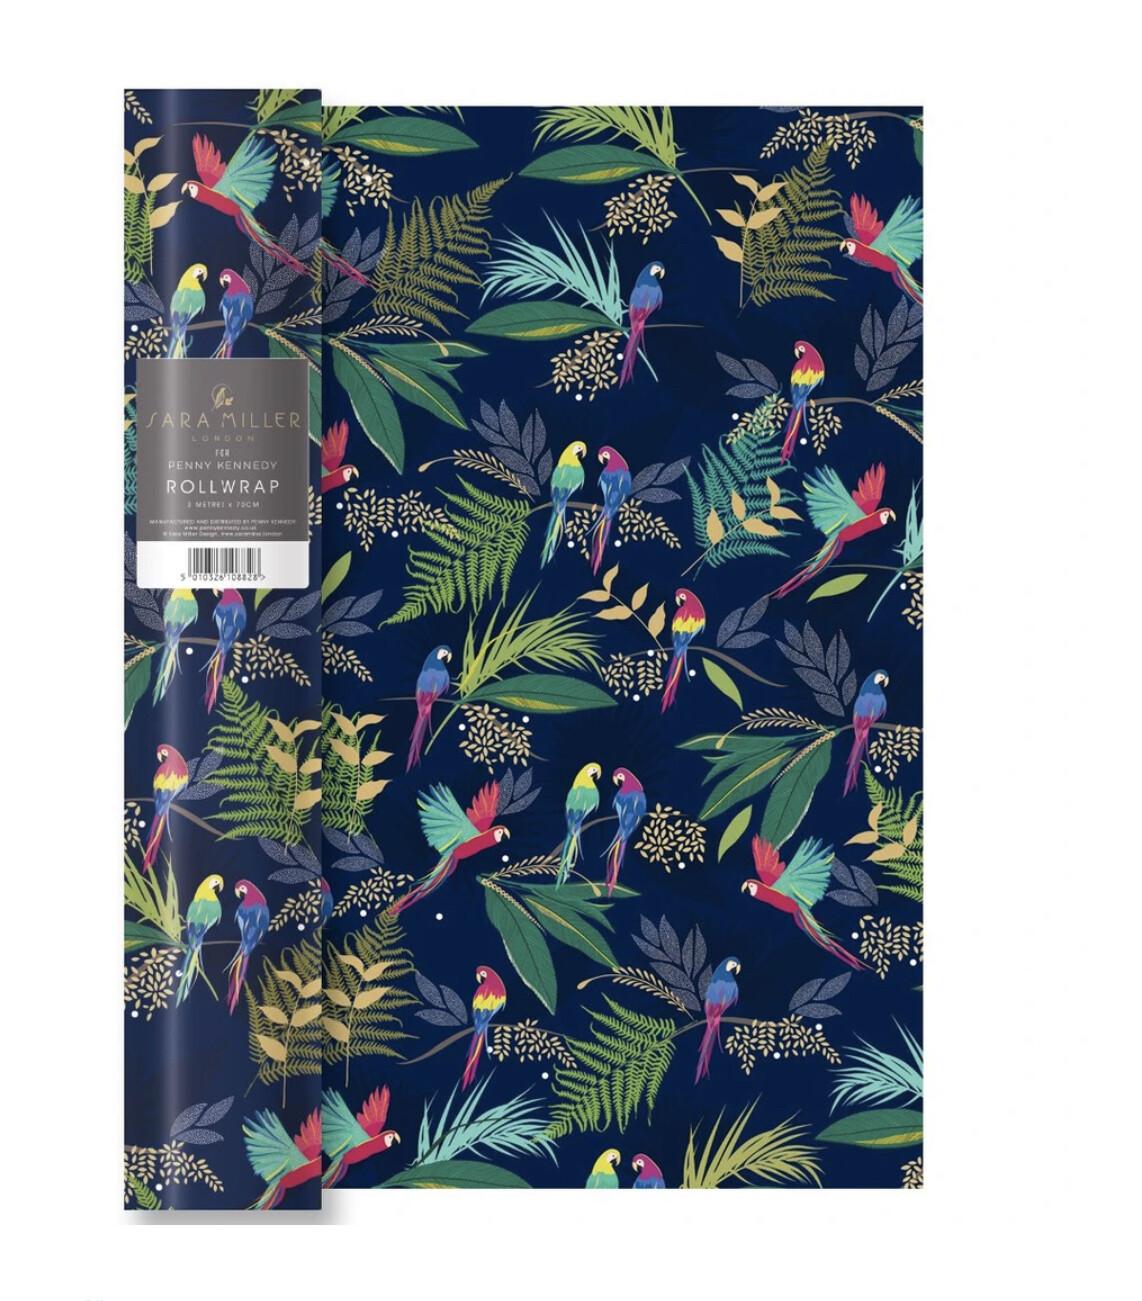 SARA MILLER LONDON - Parrot Wrapping Paper - 68cm x 50cm